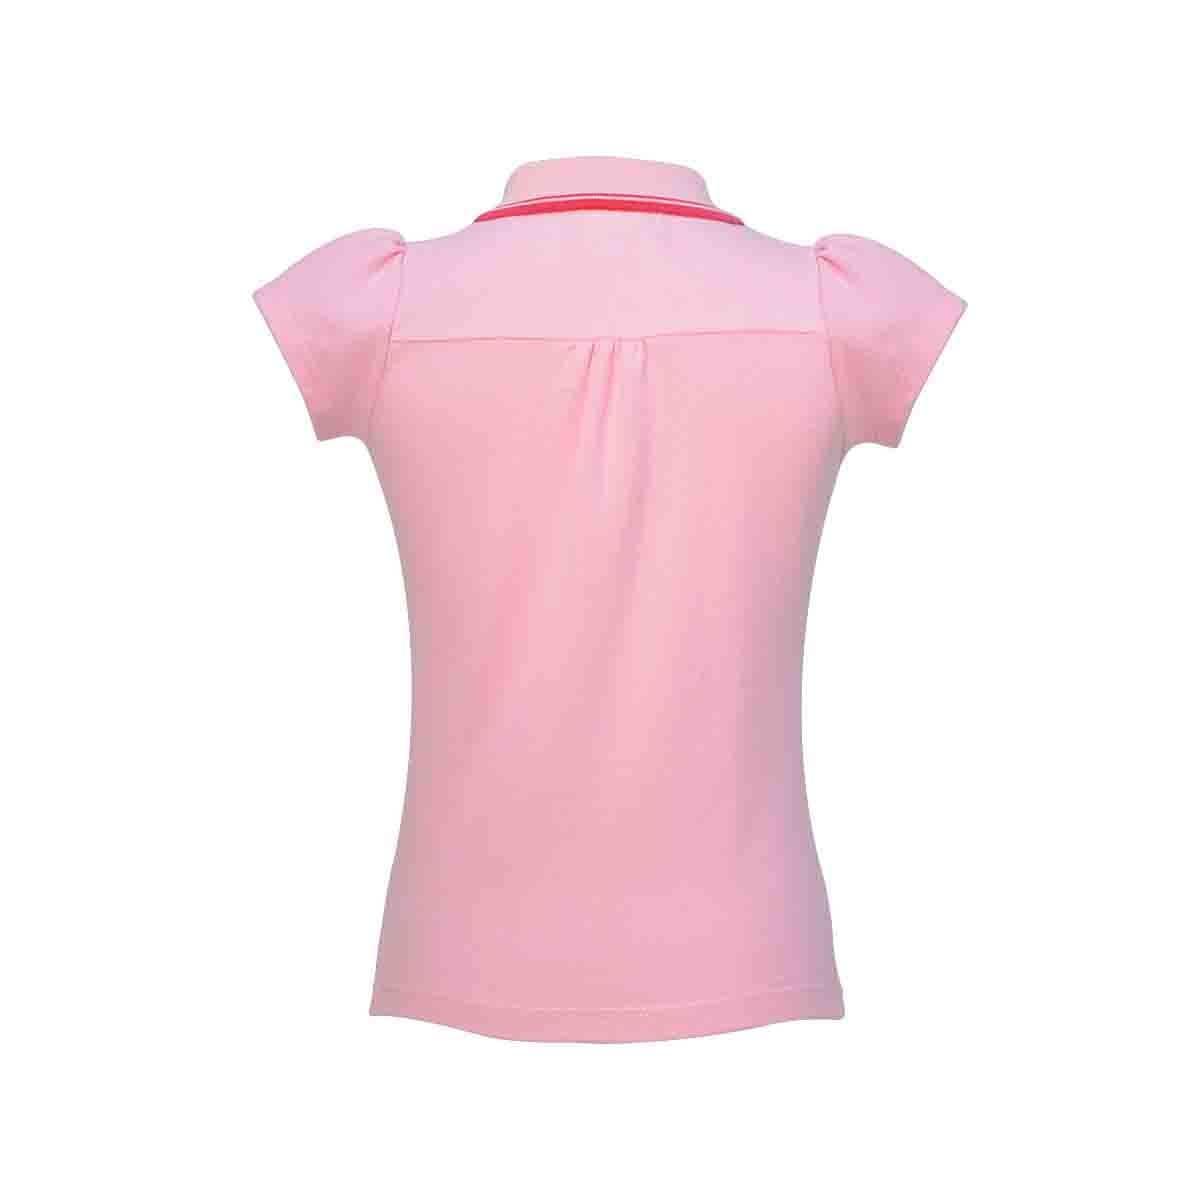 85b0e9311390 Playera con manga corta color rosa claro royal polo club